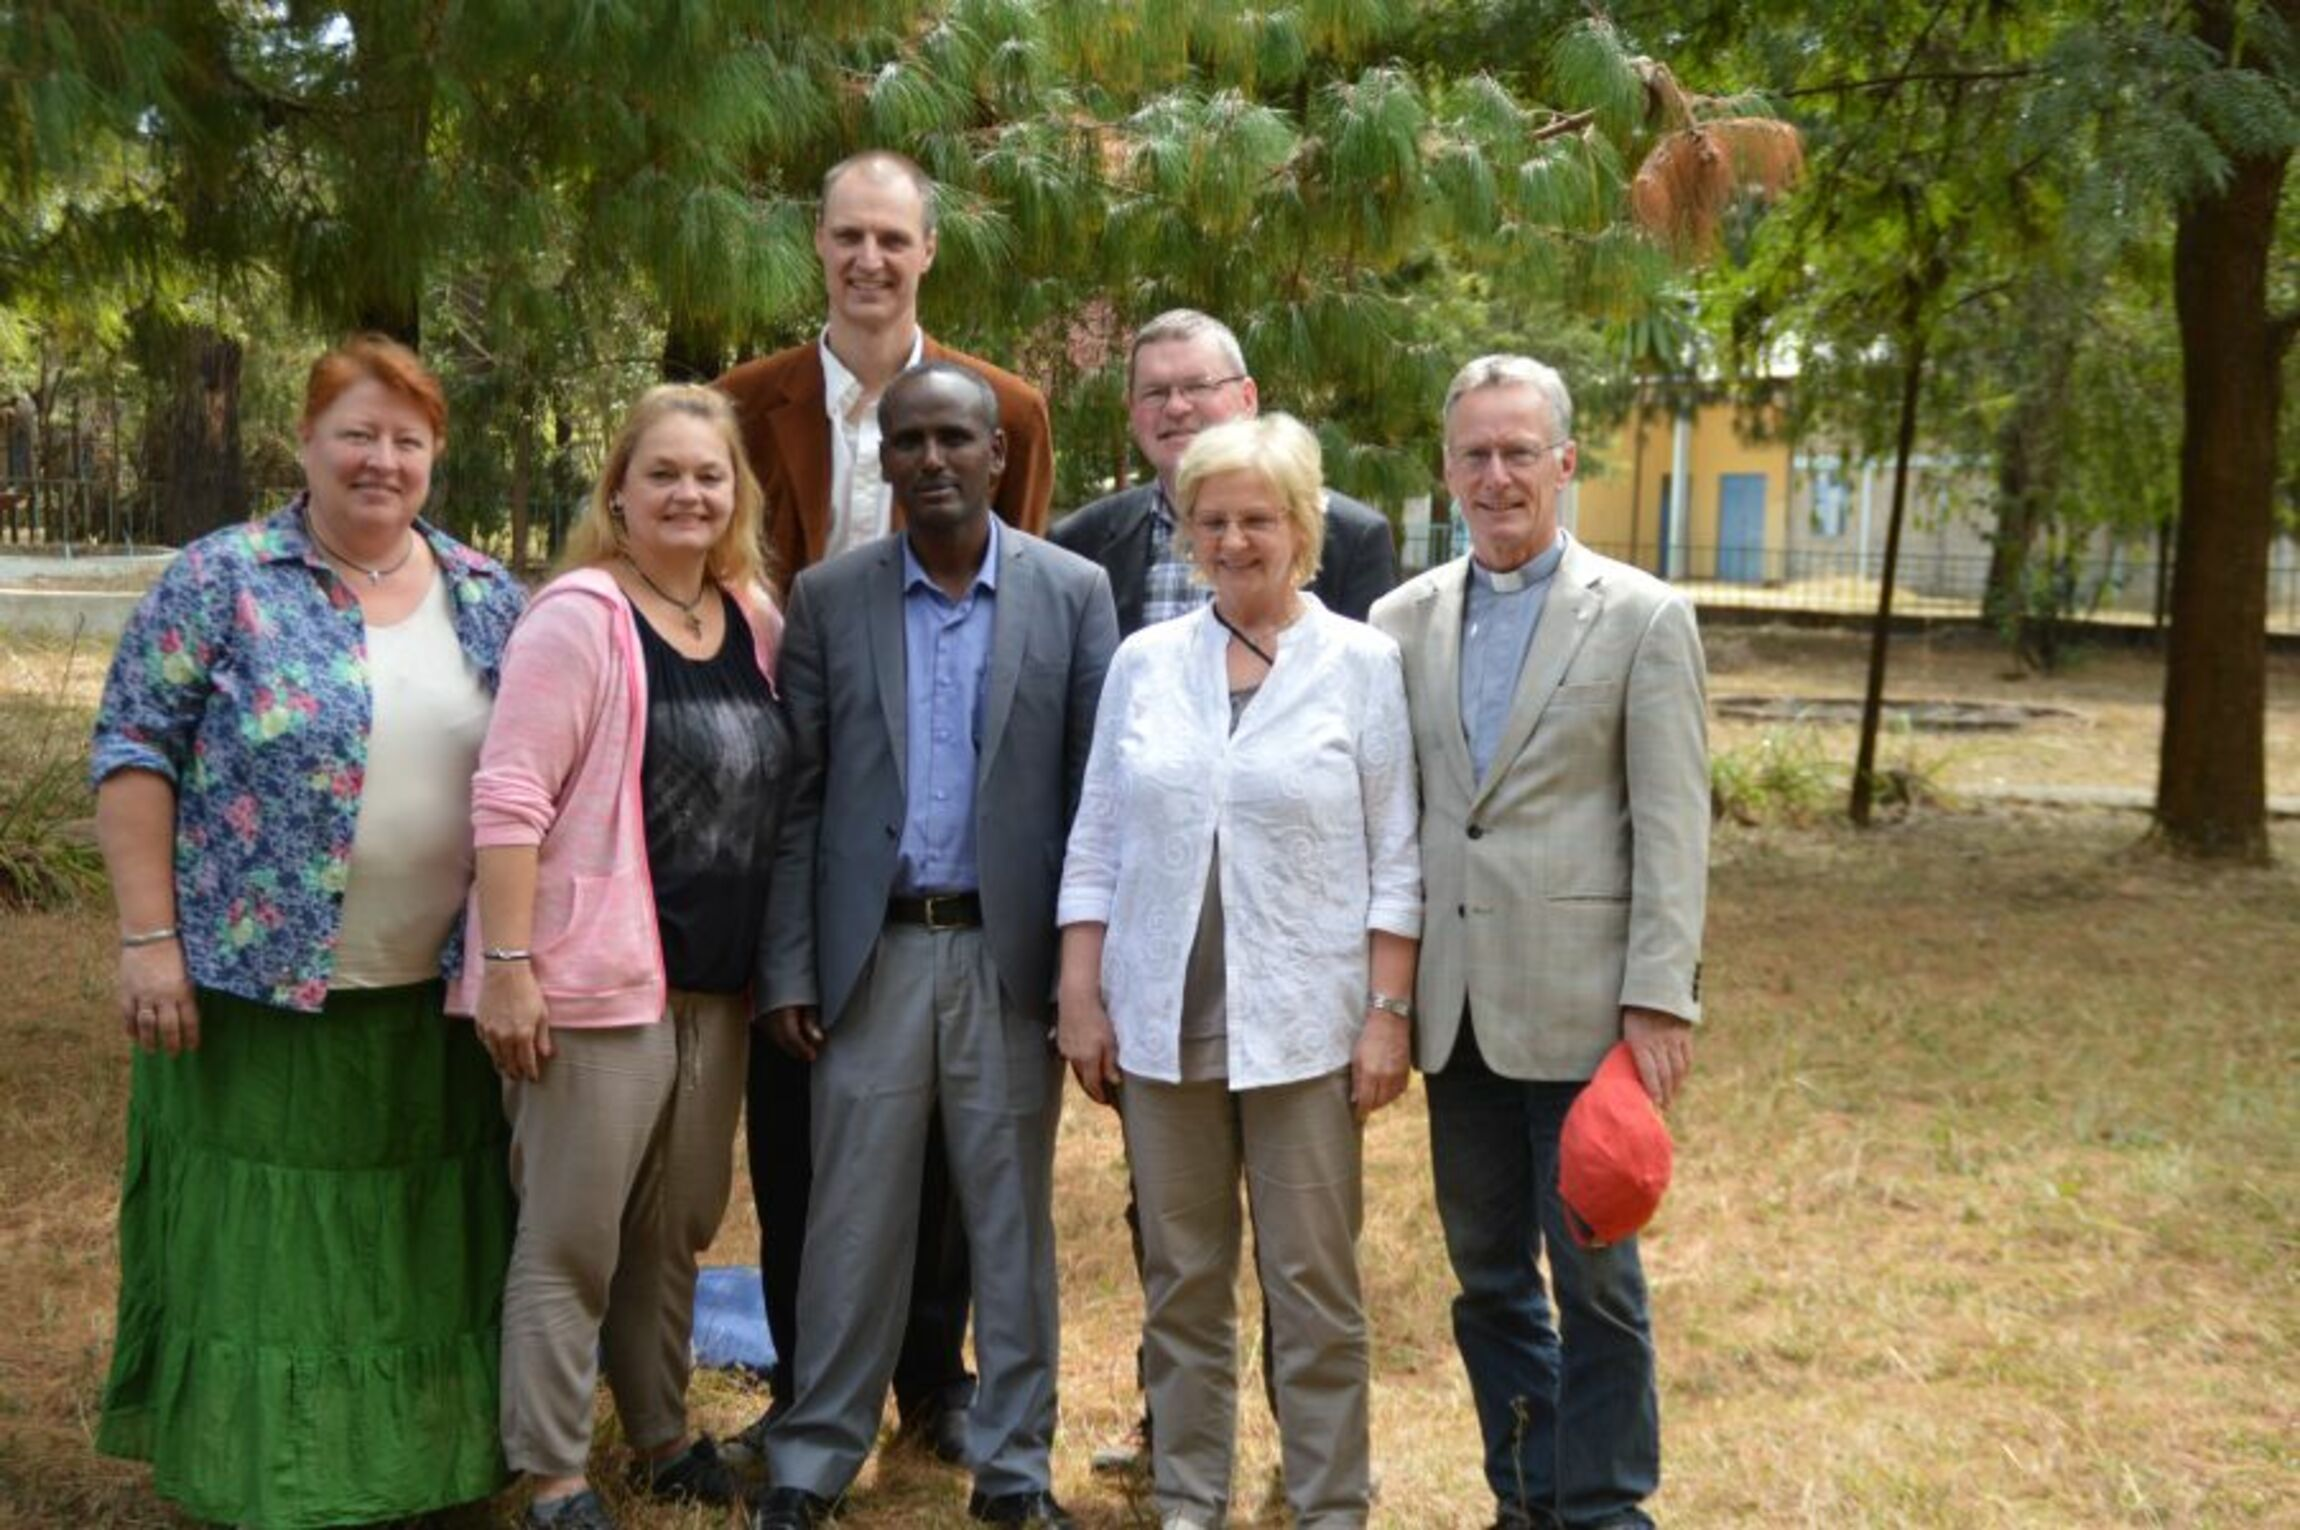 von links Regine Müller, Sonja Hertwich, Pastor Michael Fendler, Markos Shanko Mekane Jesus Kirche, Jörg Wilhelm Meier, Uta Yazdi, Pastor Peter Placke